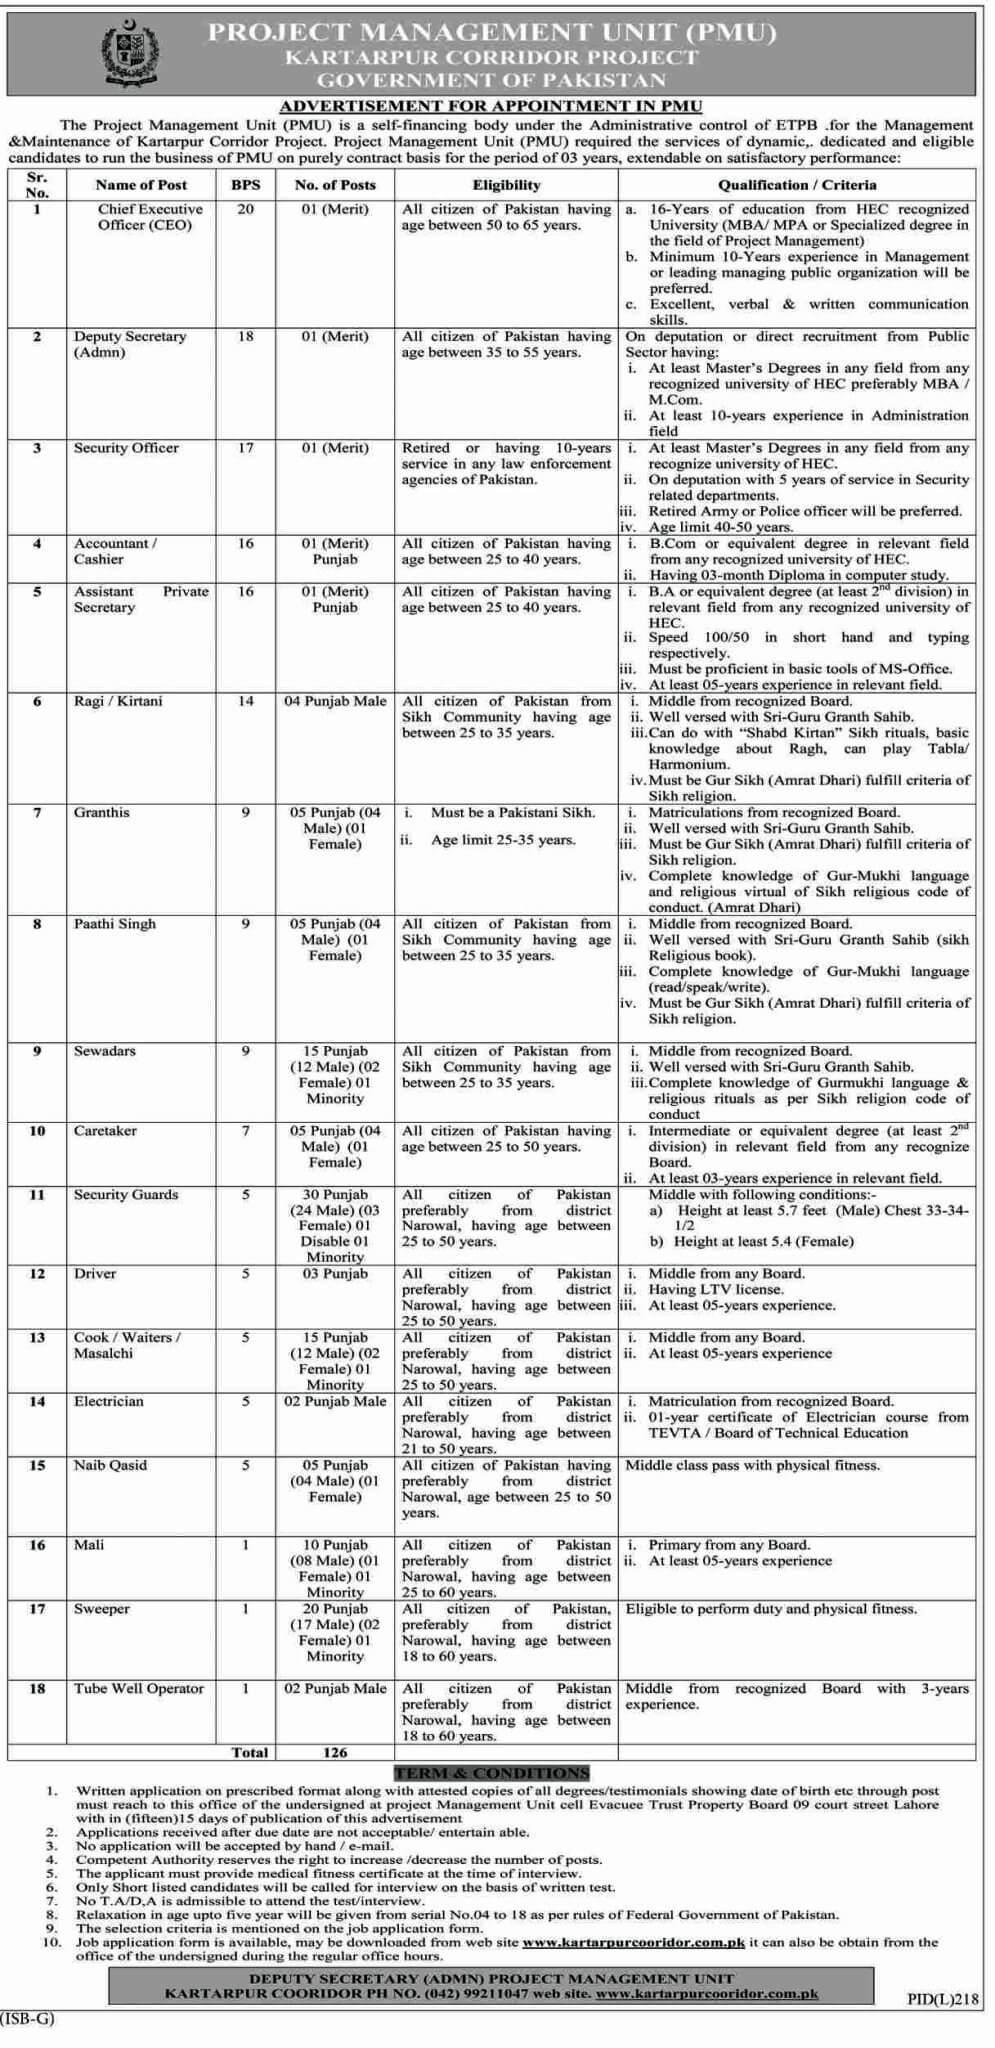 Kartarpur Corridor Jobs 2021 in Pakistan - www.kartarpurcorridor.com.pk Jobs 2021